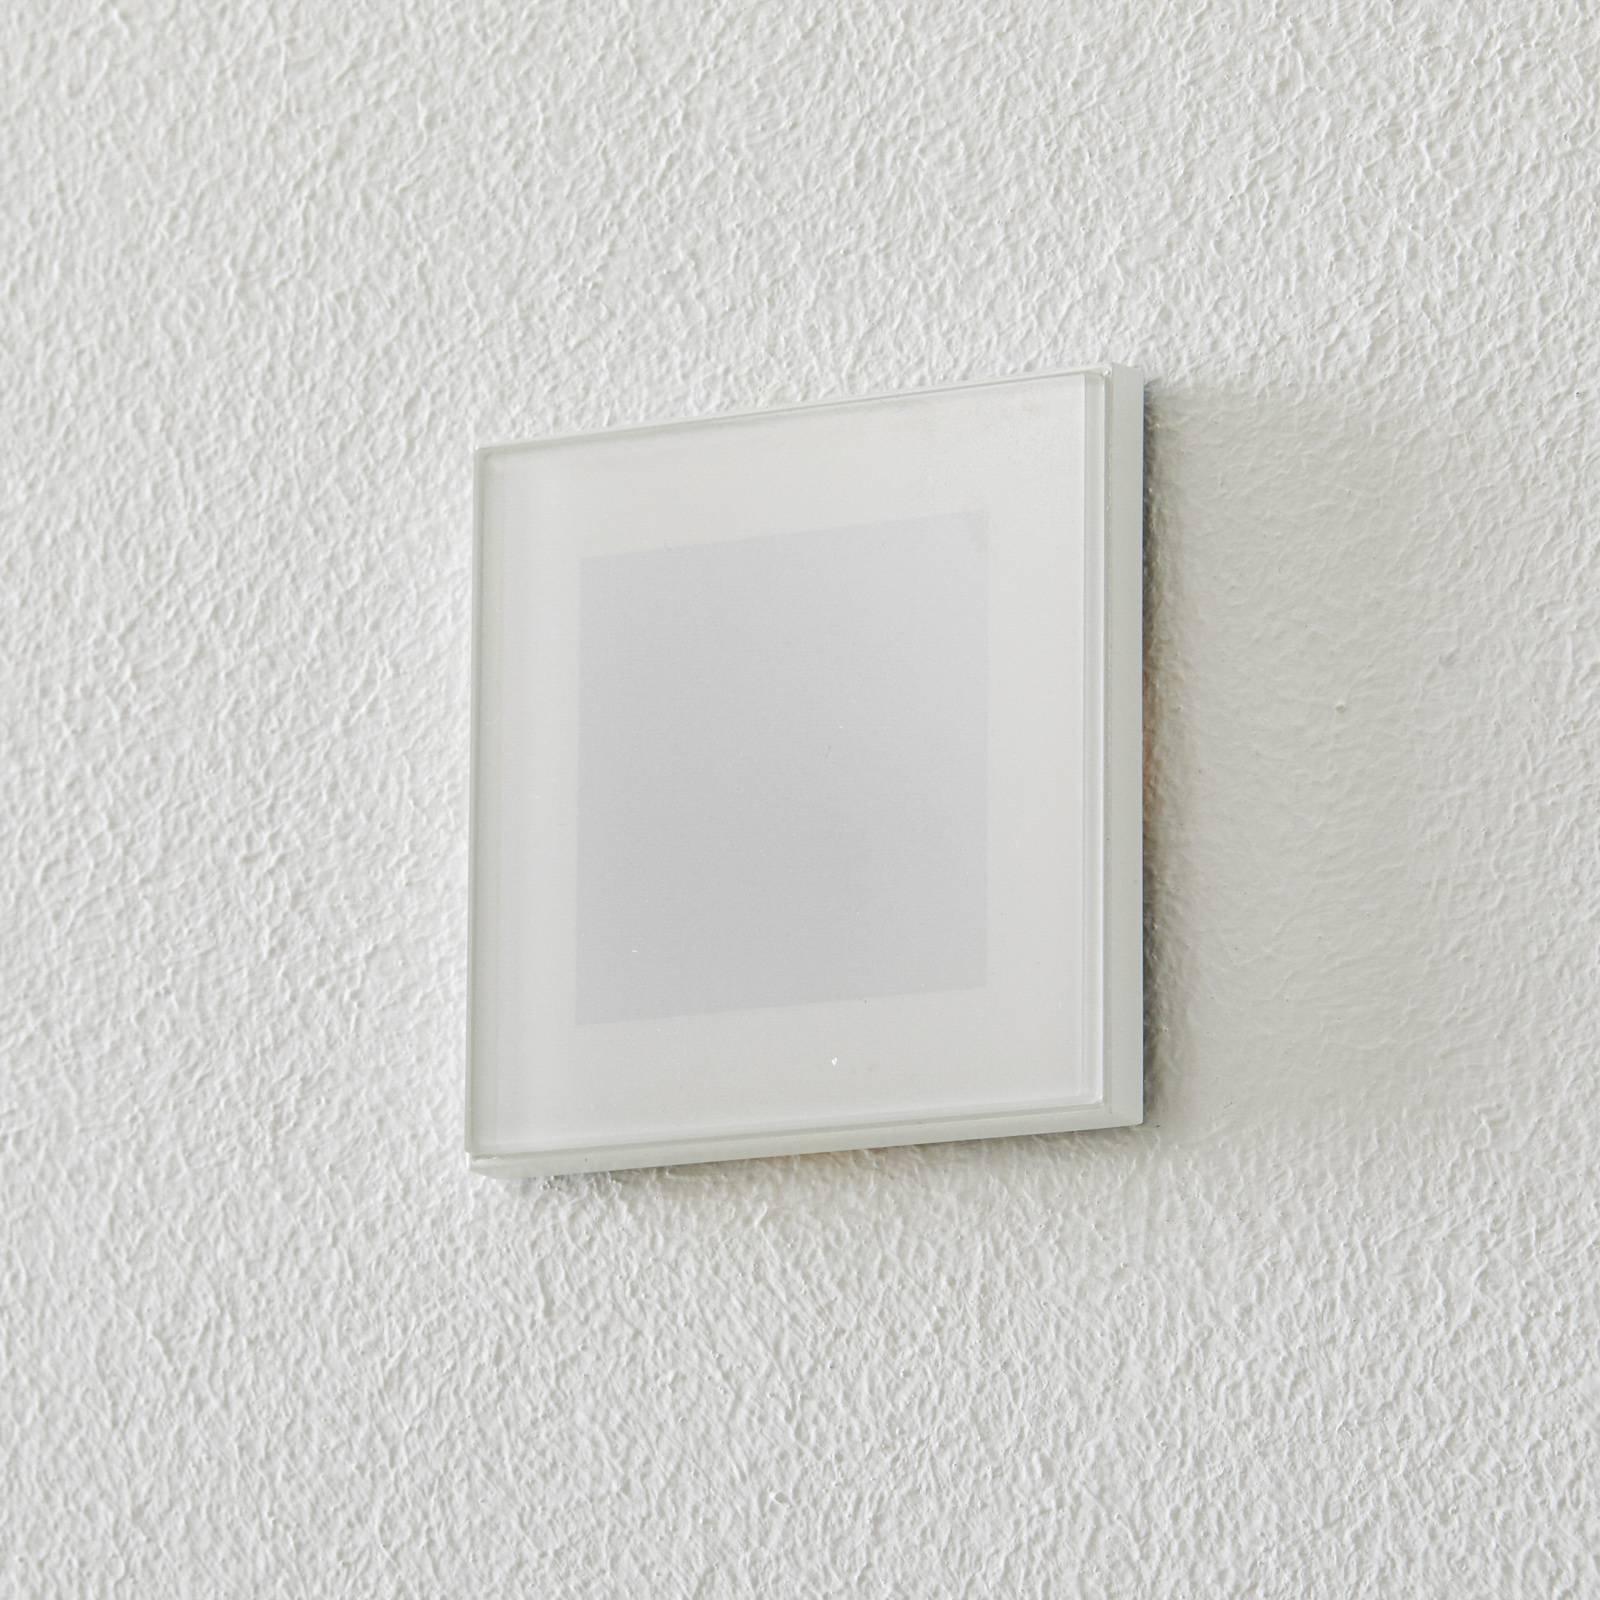 BEGA Accenta veggmontering kantet ring hvit 160lm